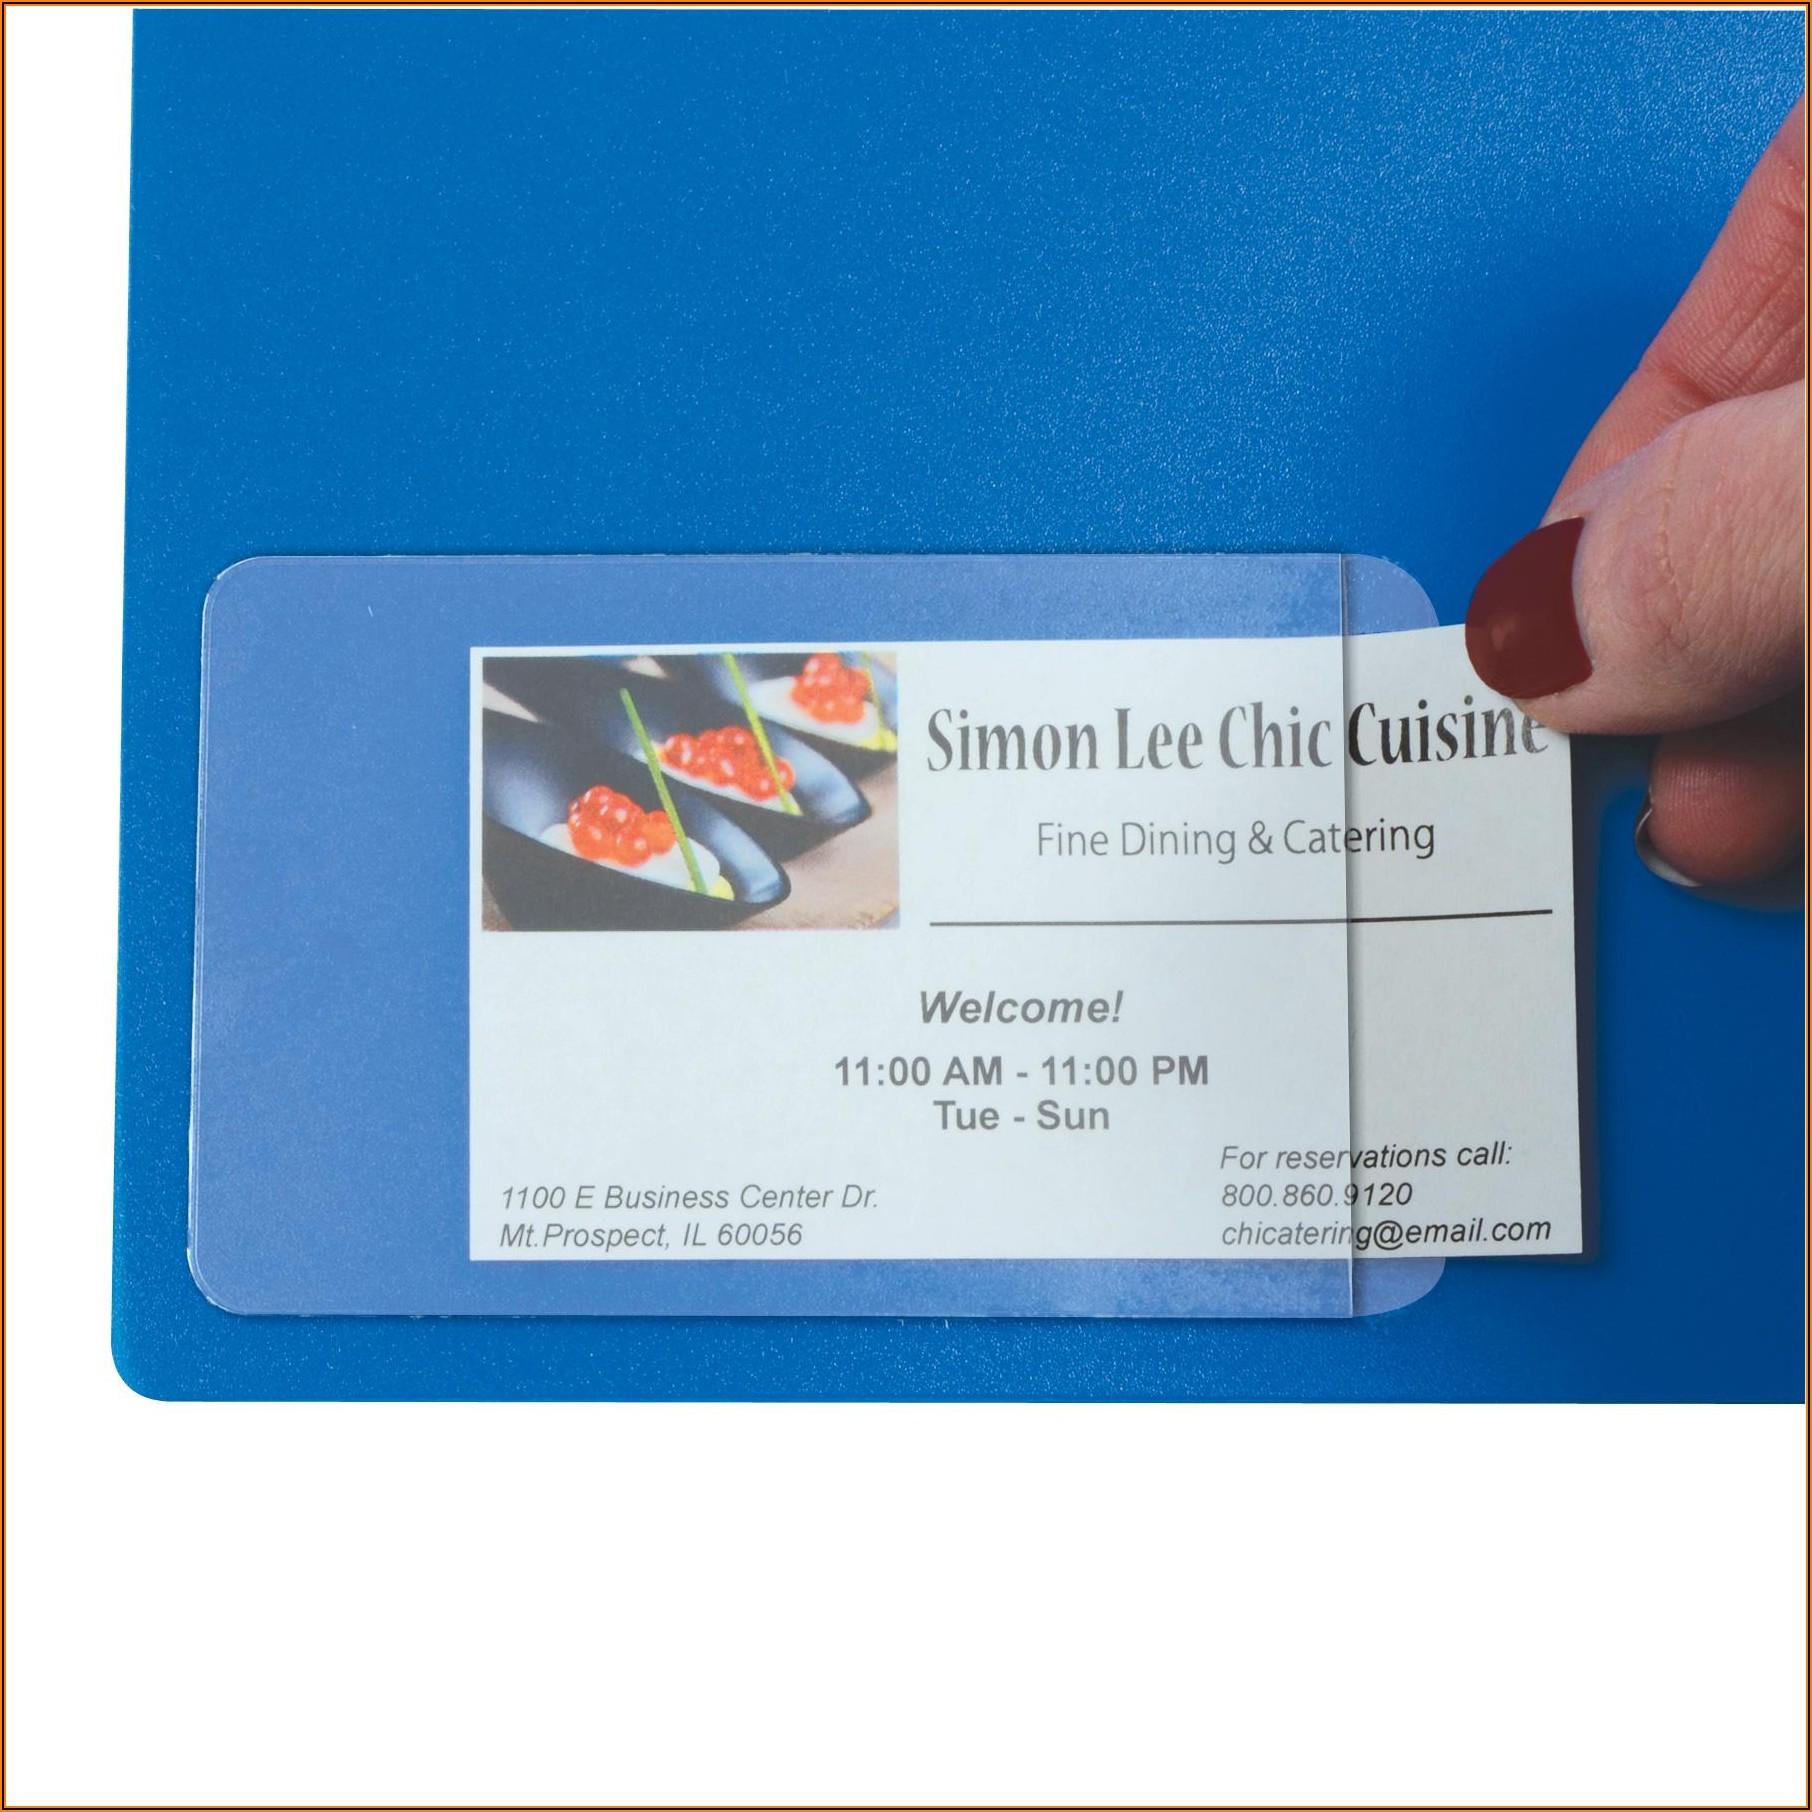 Uline Adhesive Business Card Holder